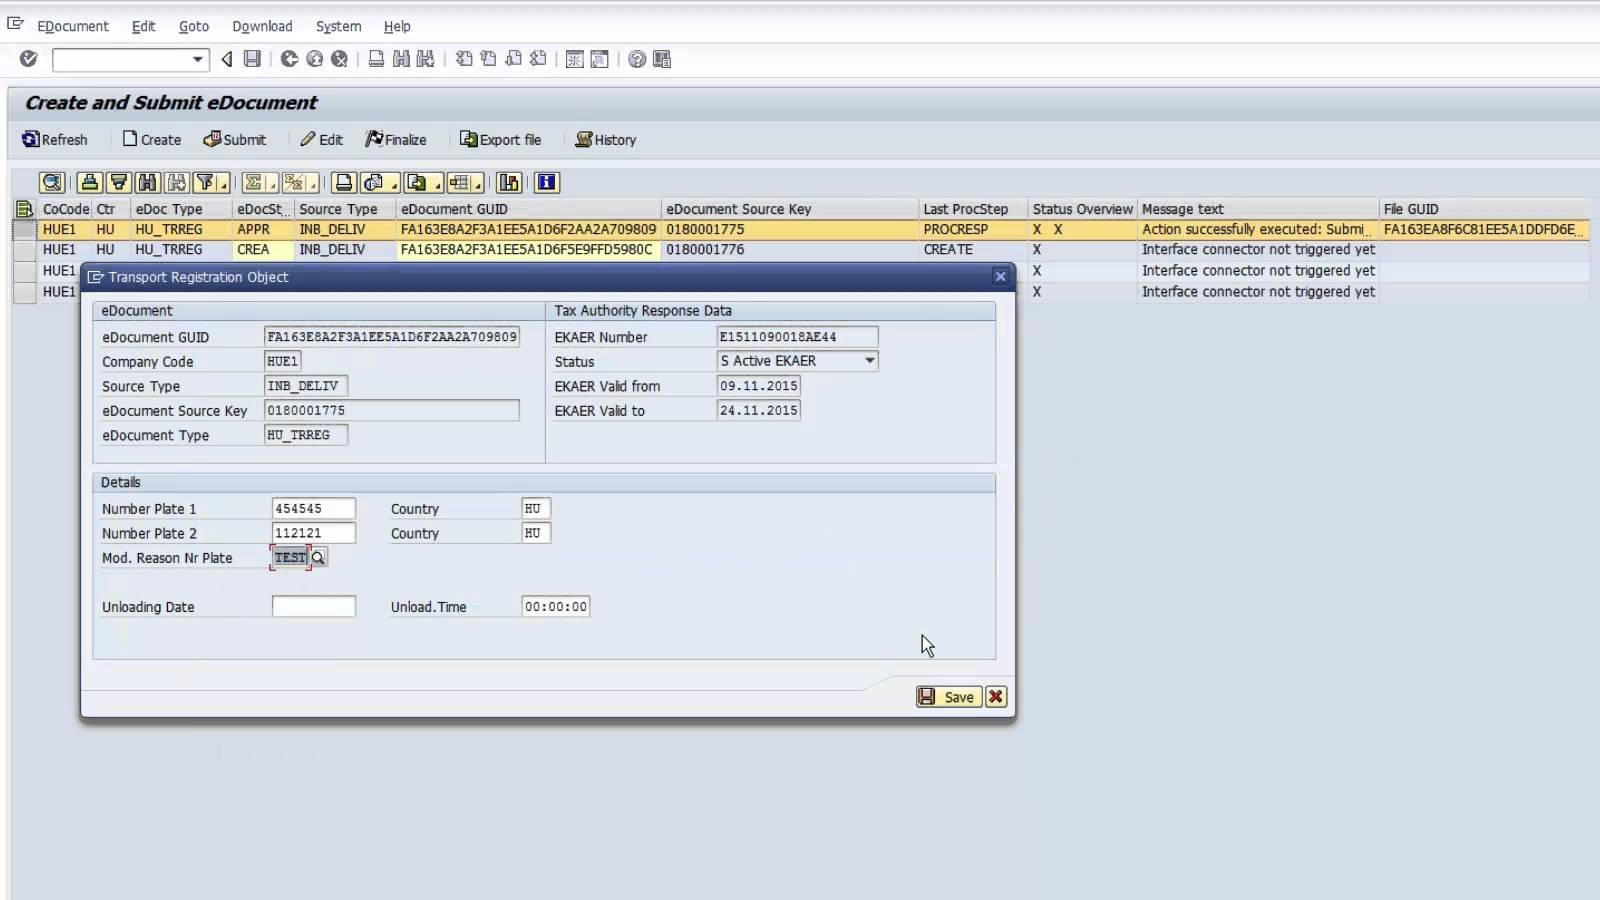 ariba invoice management invoice template free 2016 sap invoice management